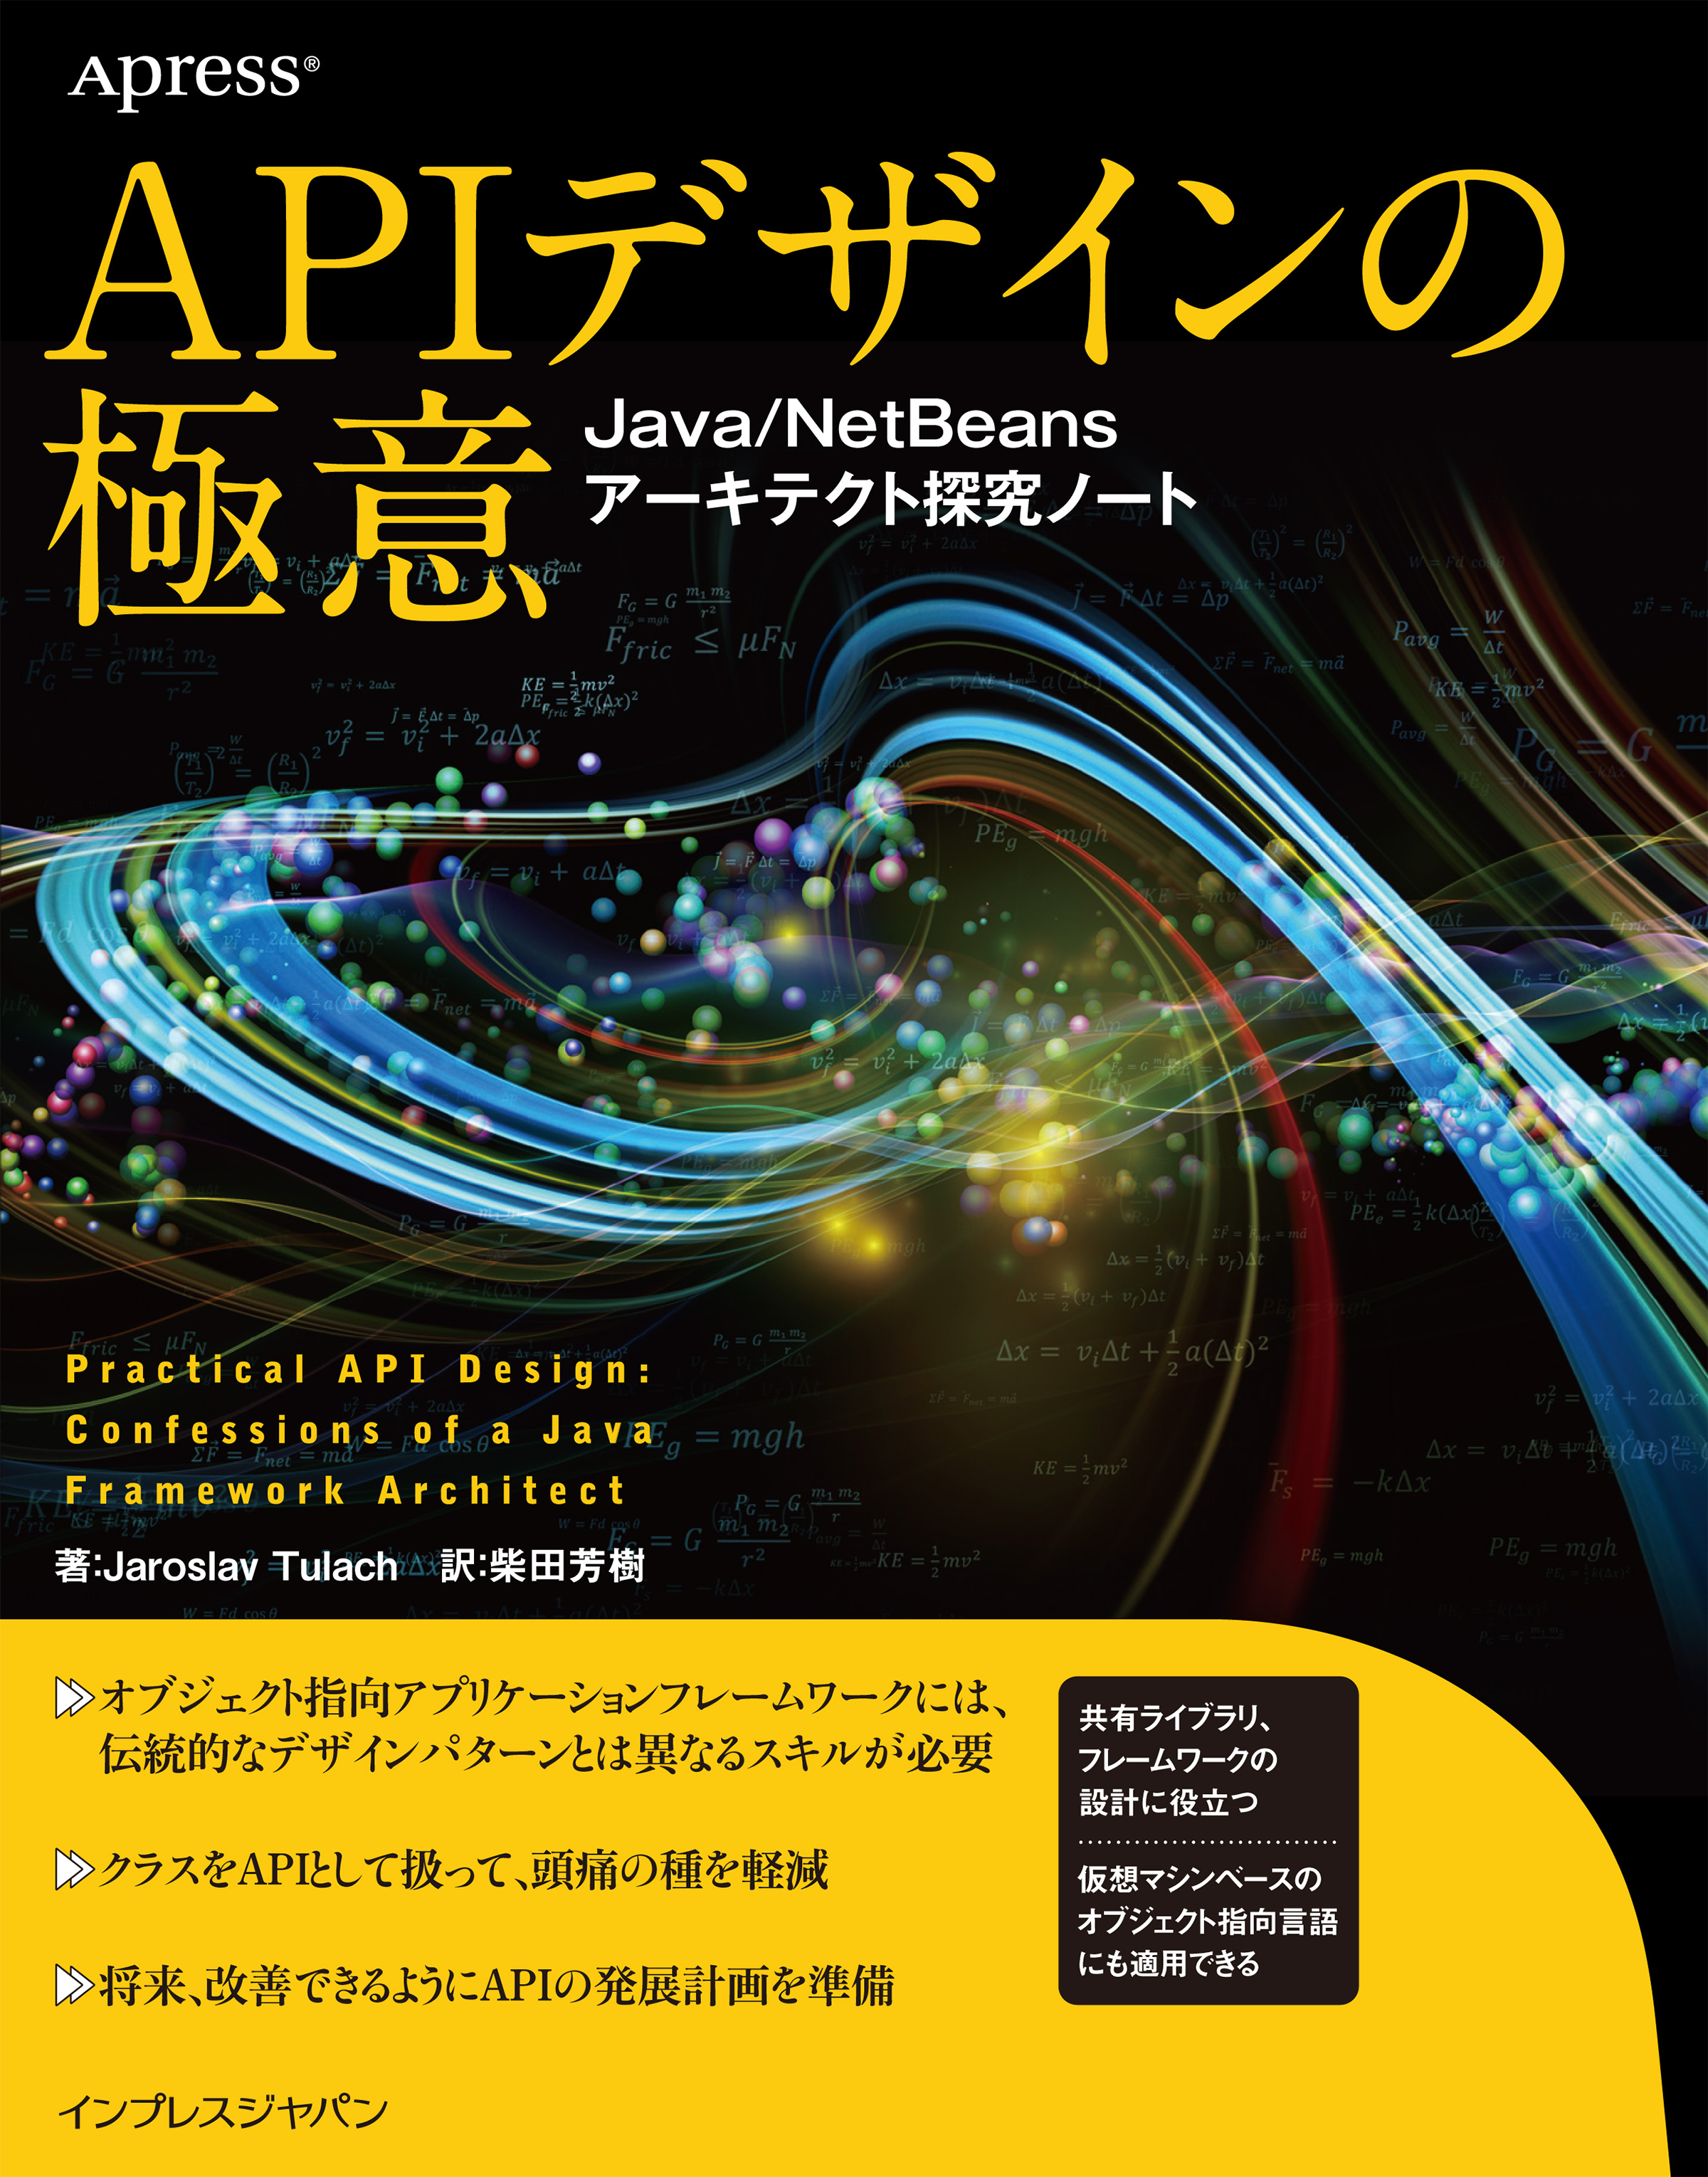 Google Book Cover Images Api ~ Apiデザインの極意 java netbeansアーキテクト探究ノート【委託】 達人出版会